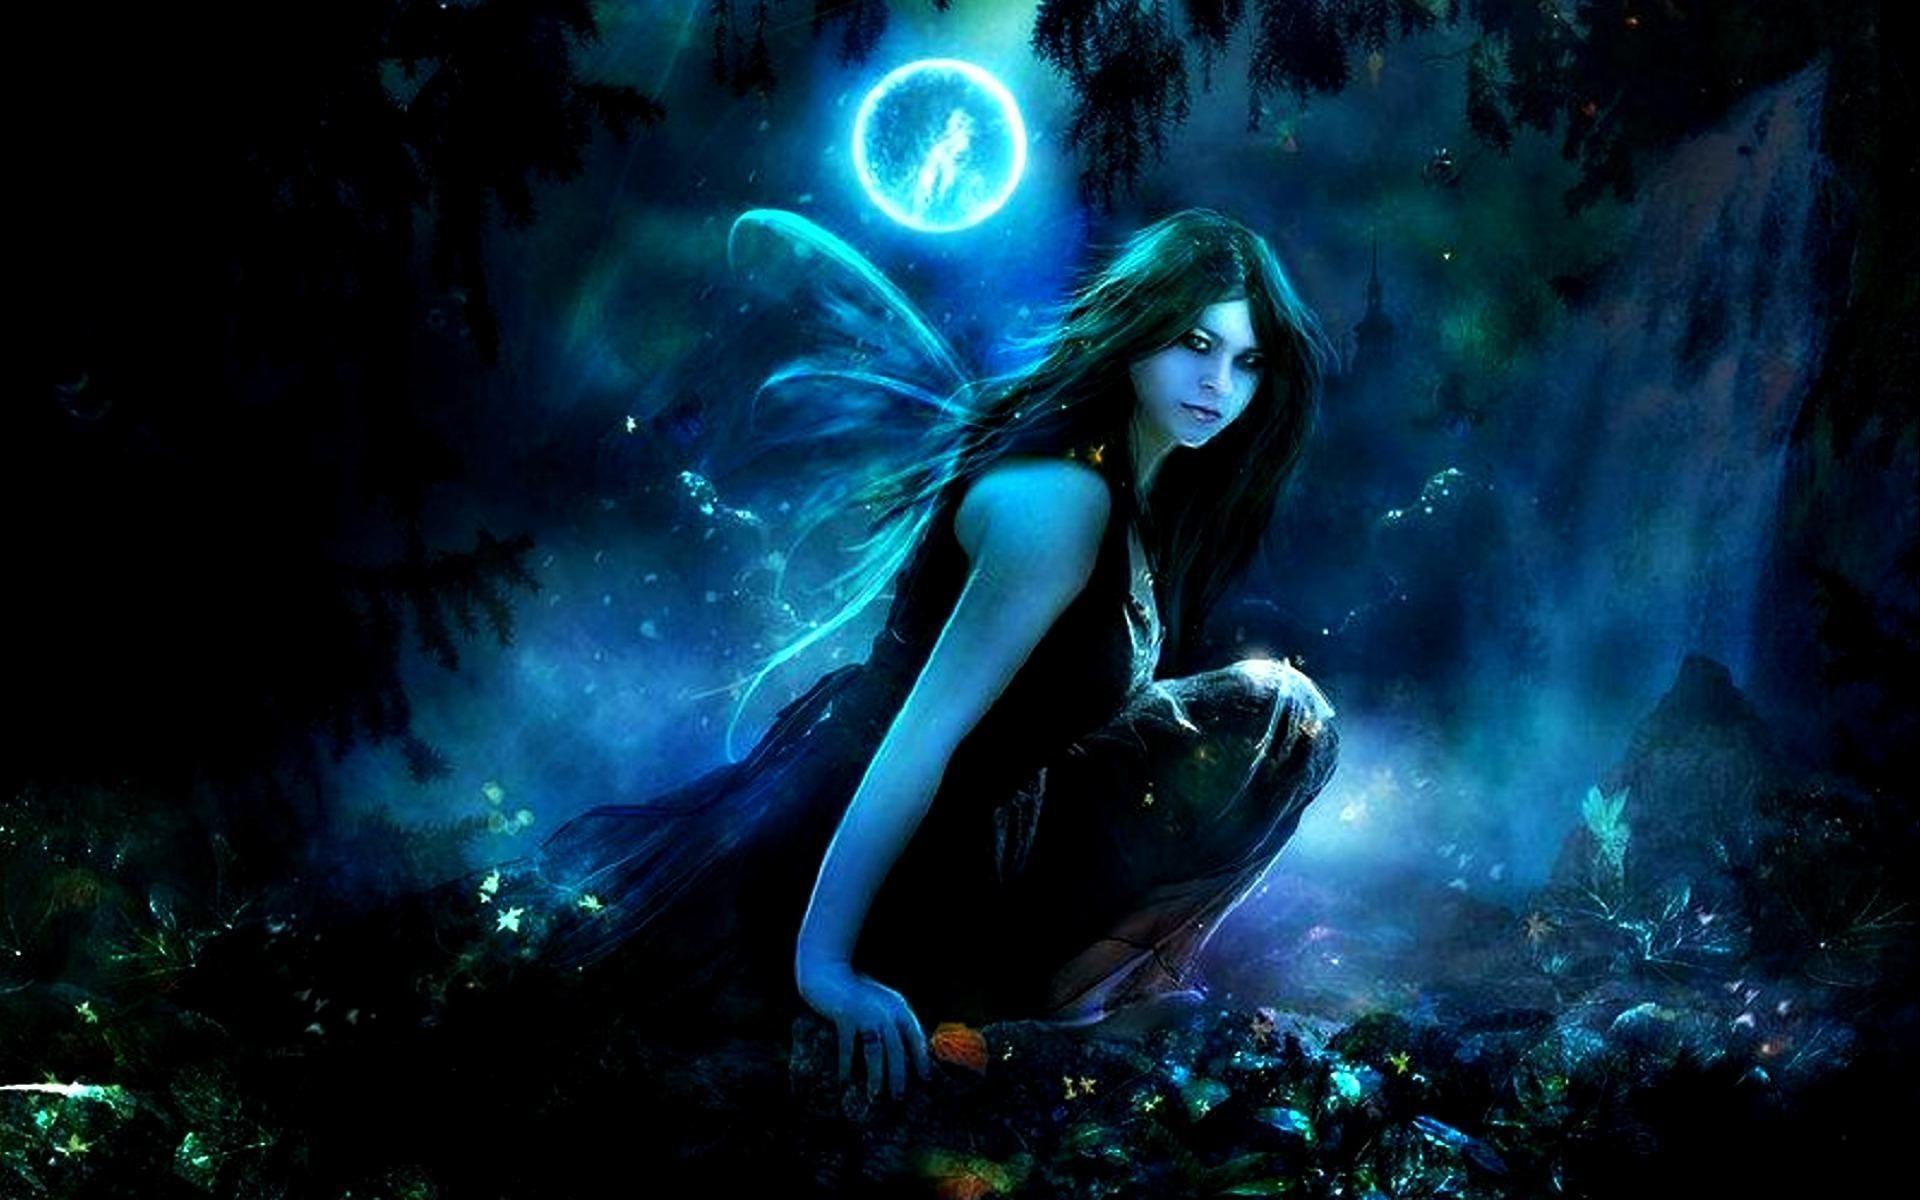 Dark Fairy Wallpapers Top Free Dark Fairy Backgrounds